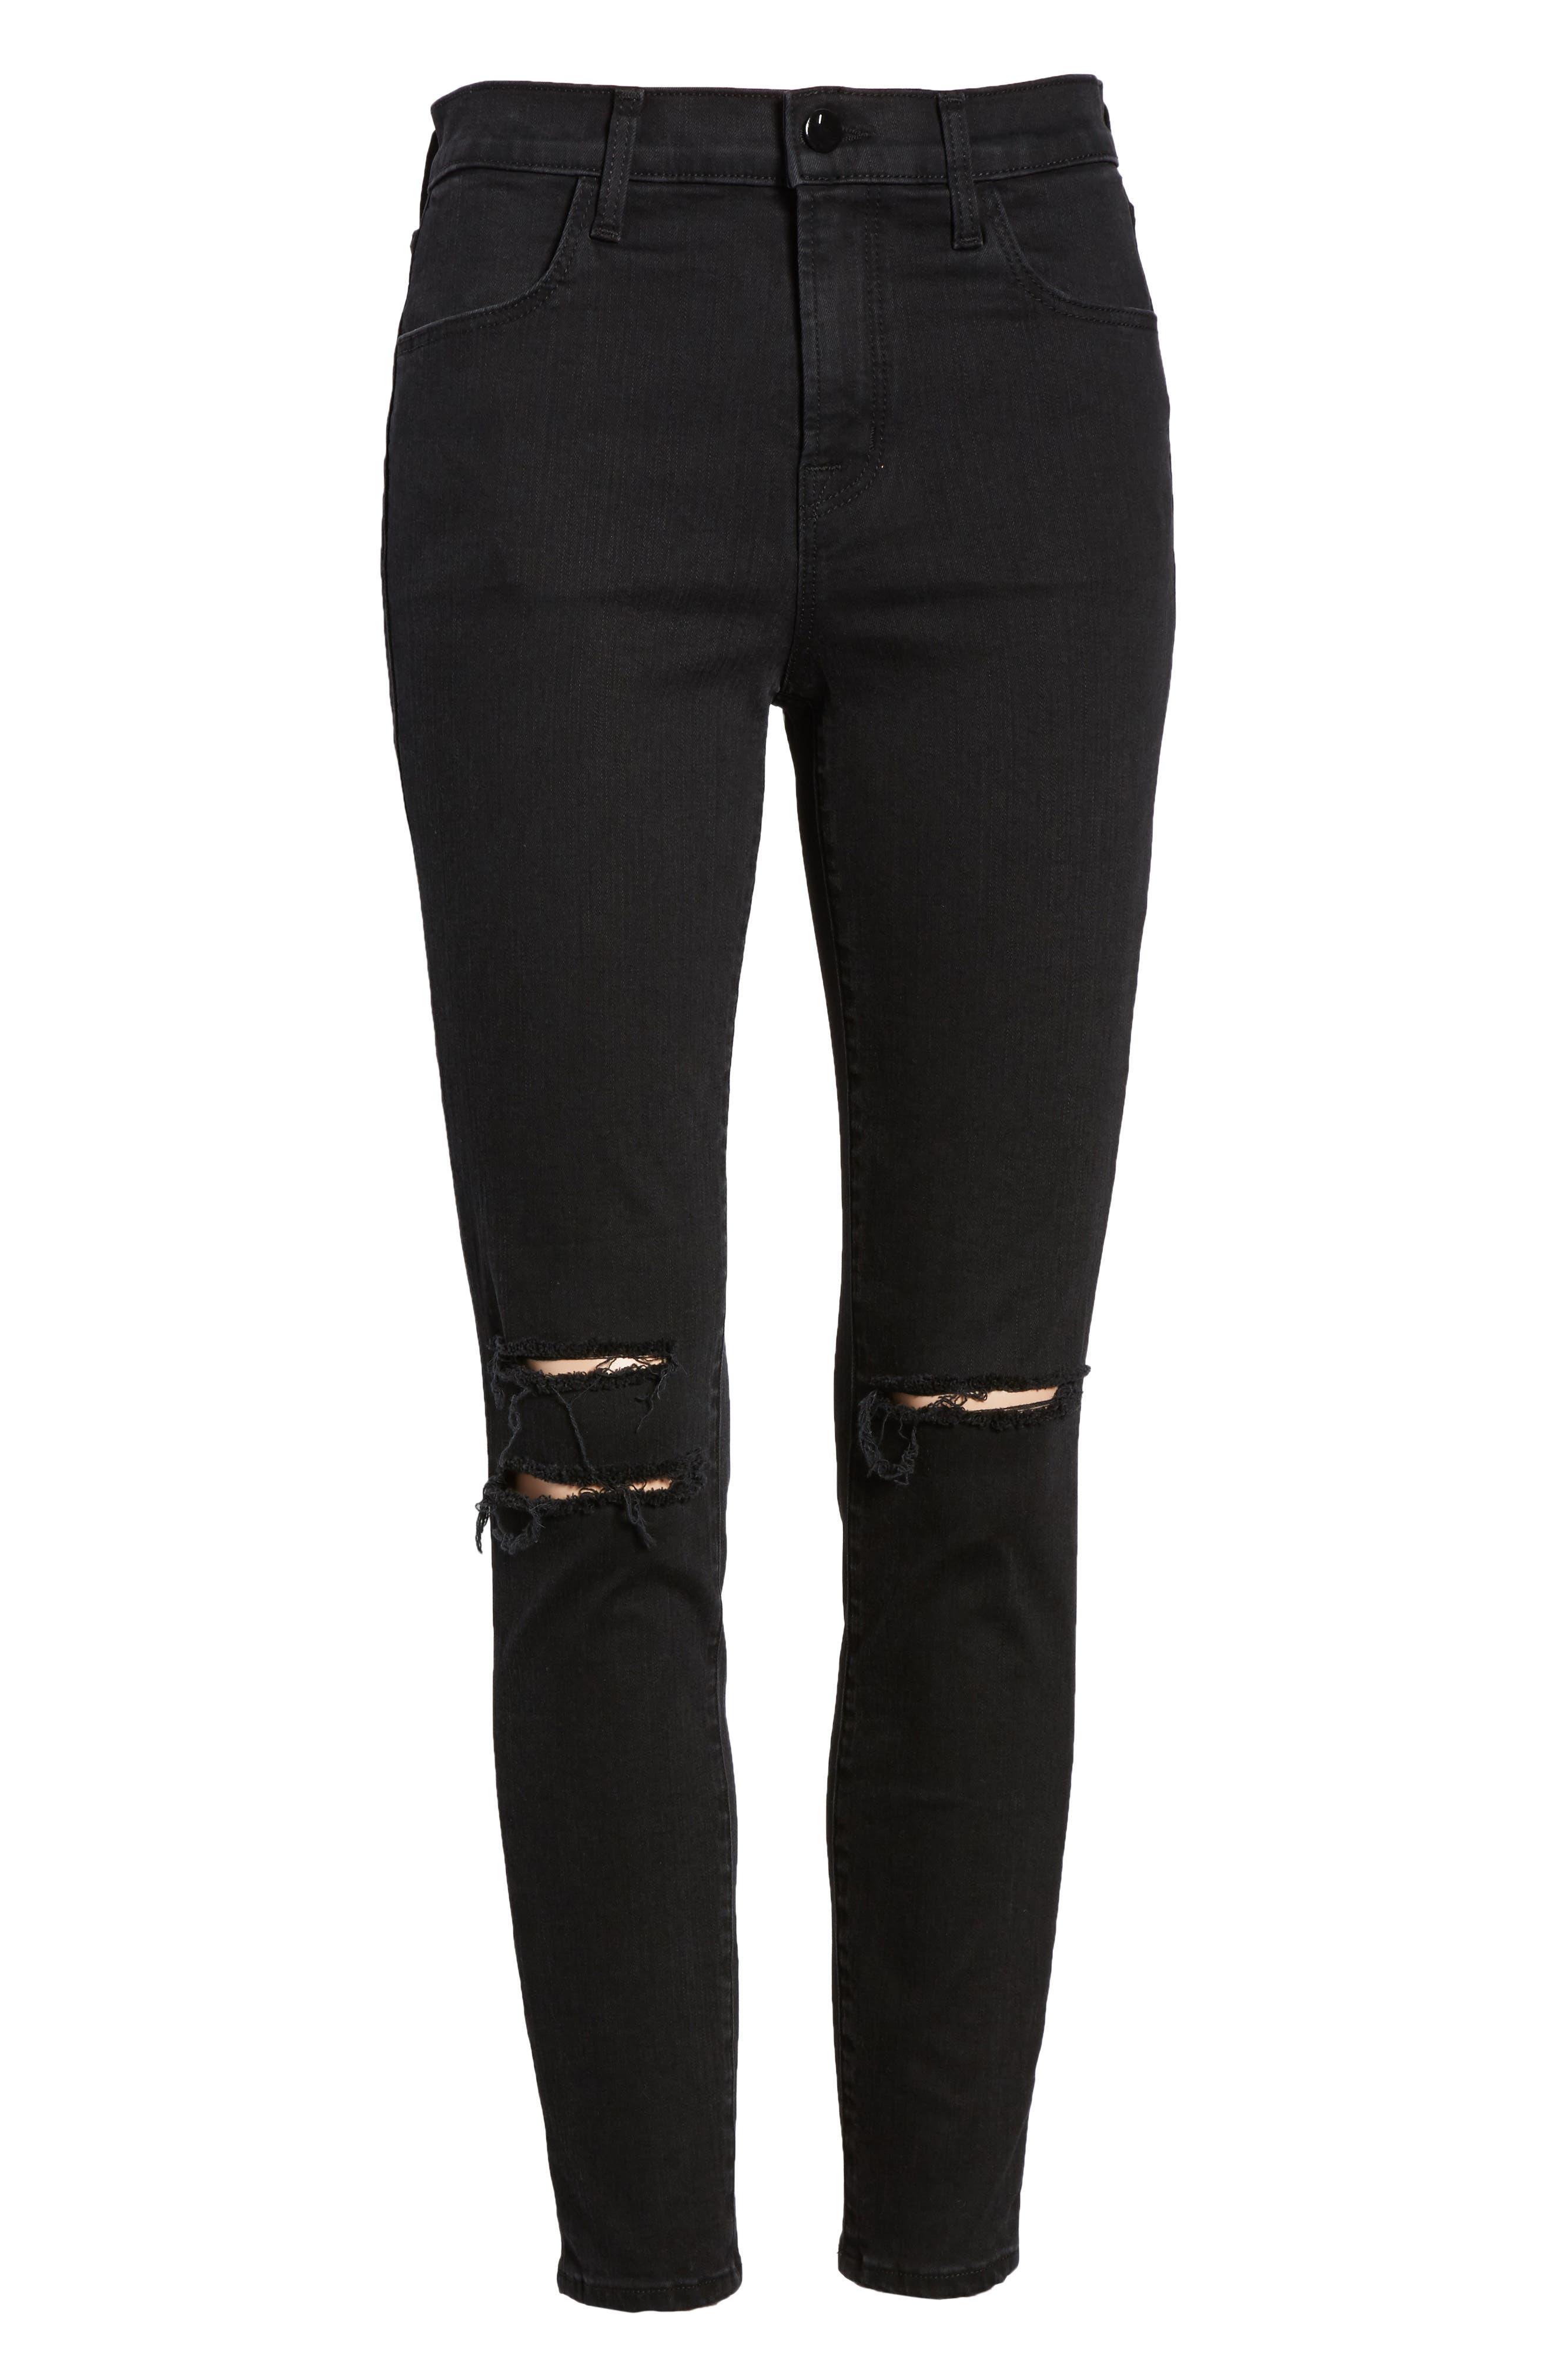 Alana High Waist Ankle Skinny Jeans,                             Alternate thumbnail 7, color,                             BLACK MERCY